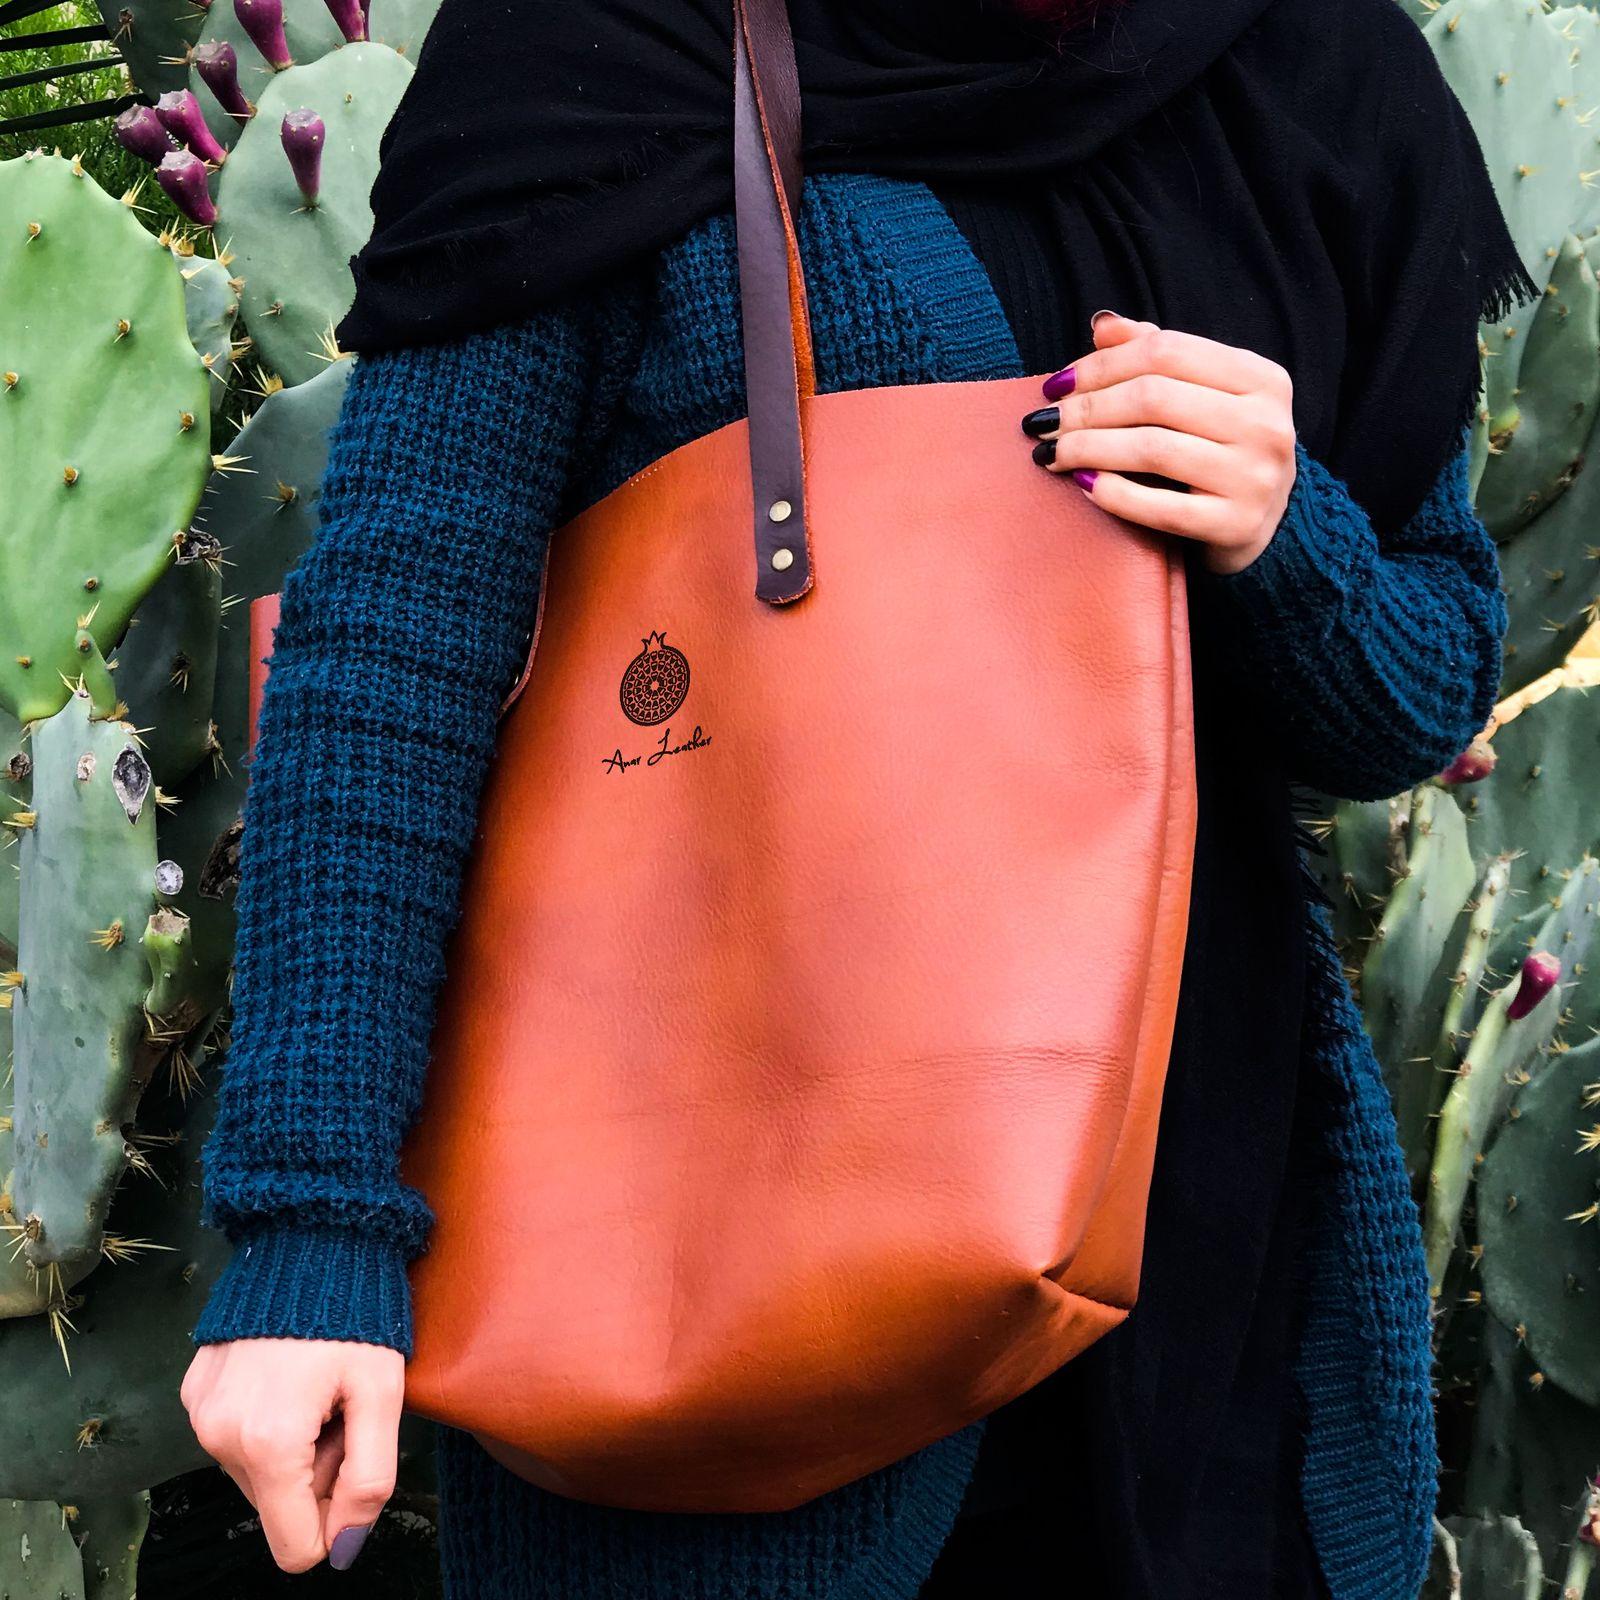 کیف دوشی زنانه انار لدر مدل کارینا -  - 10